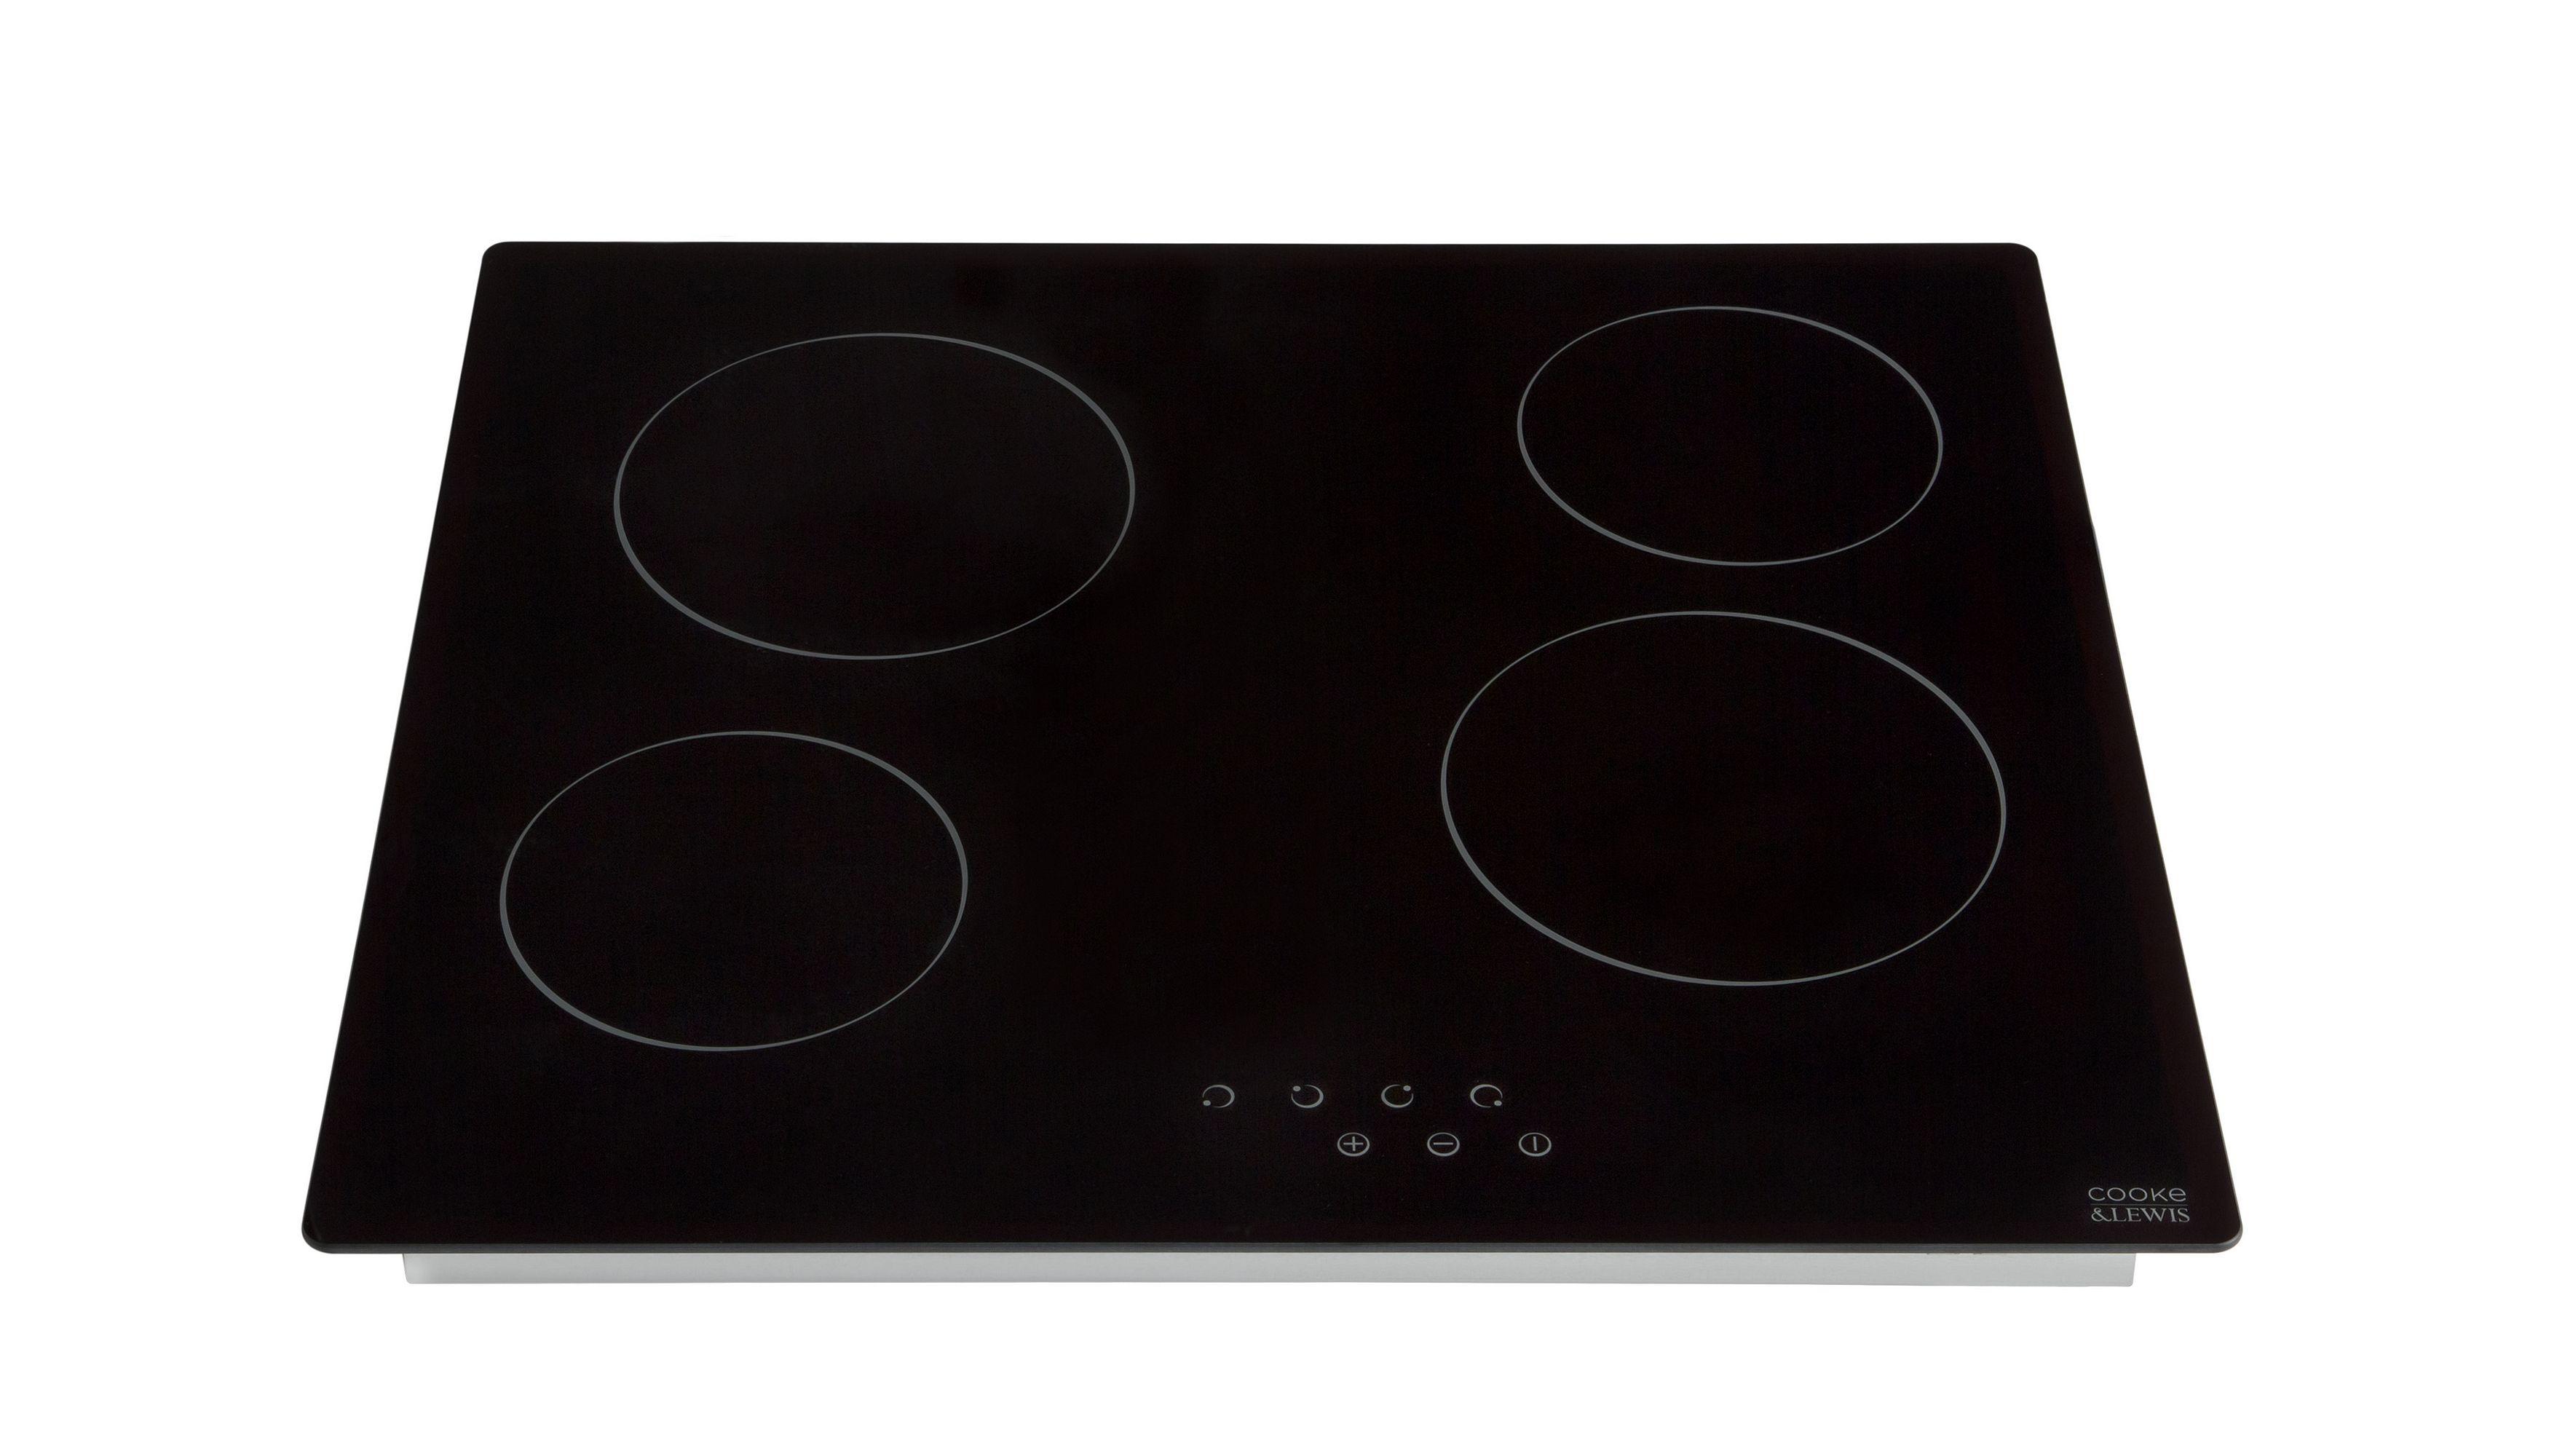 Cooke Lewis Clcer60 4 Zone Black Glass Ceramic Hob W 590mm Departments Diy At B Q